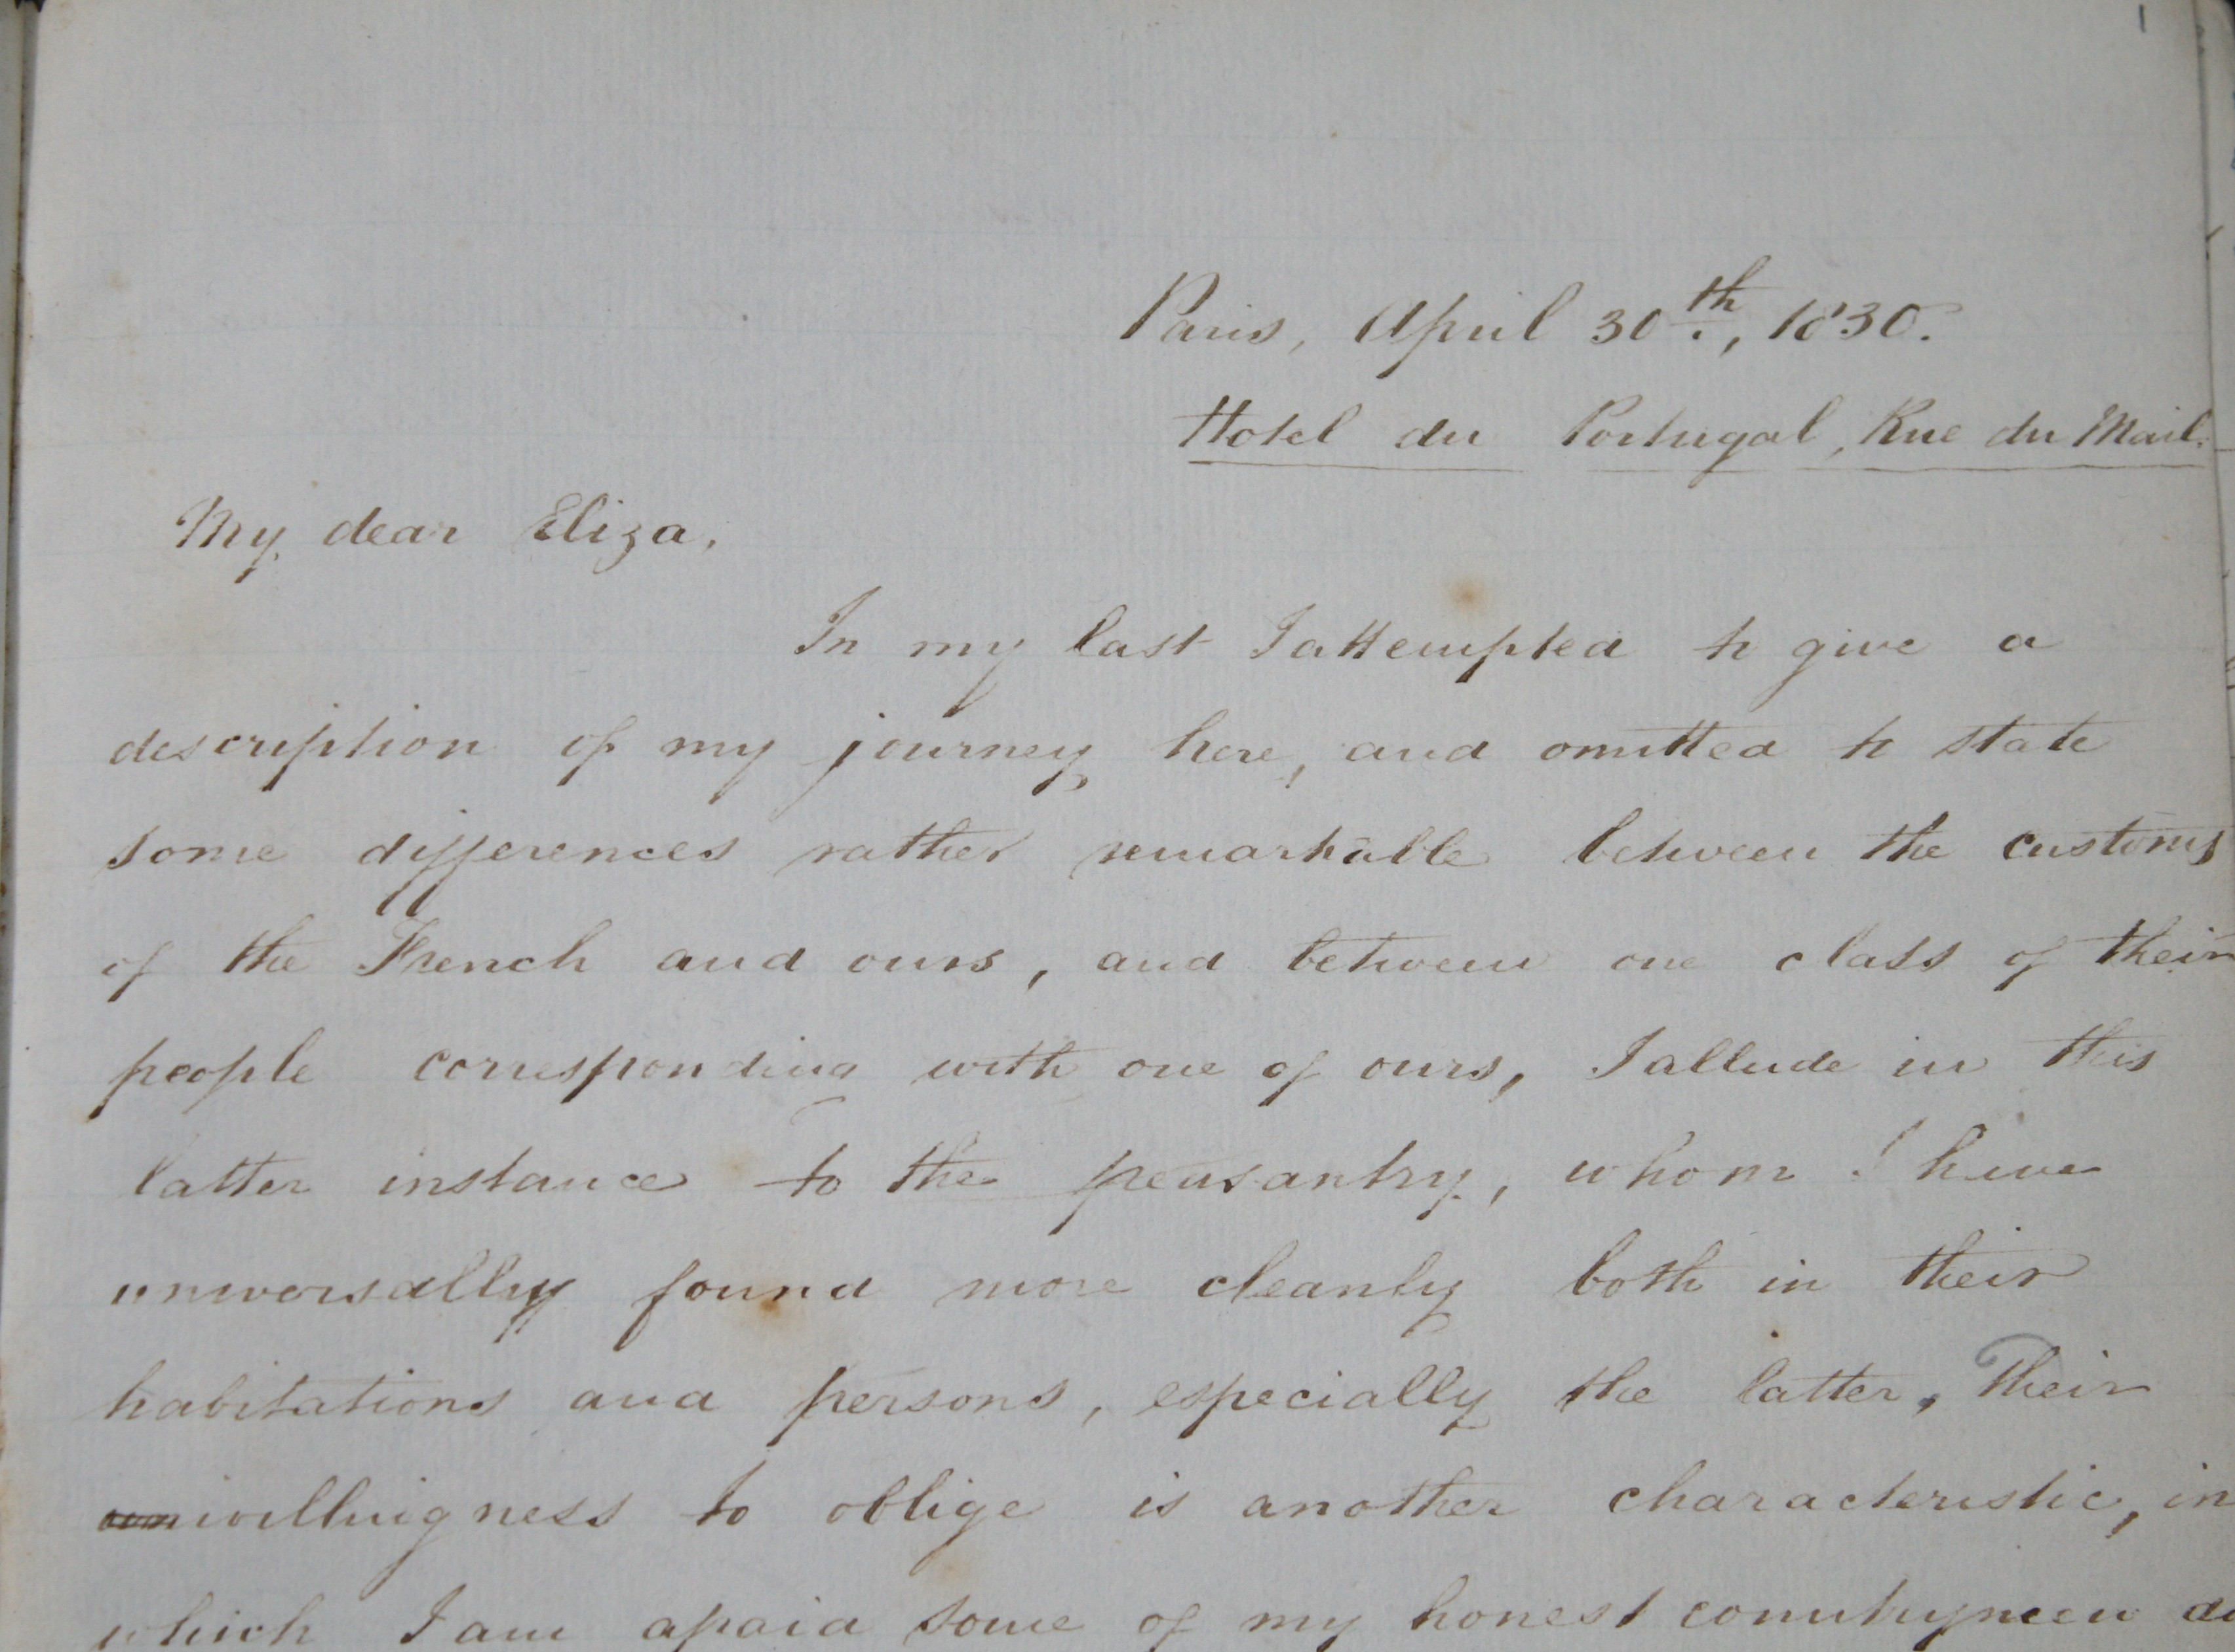 British Handwriting Professor John Jackson Introduced